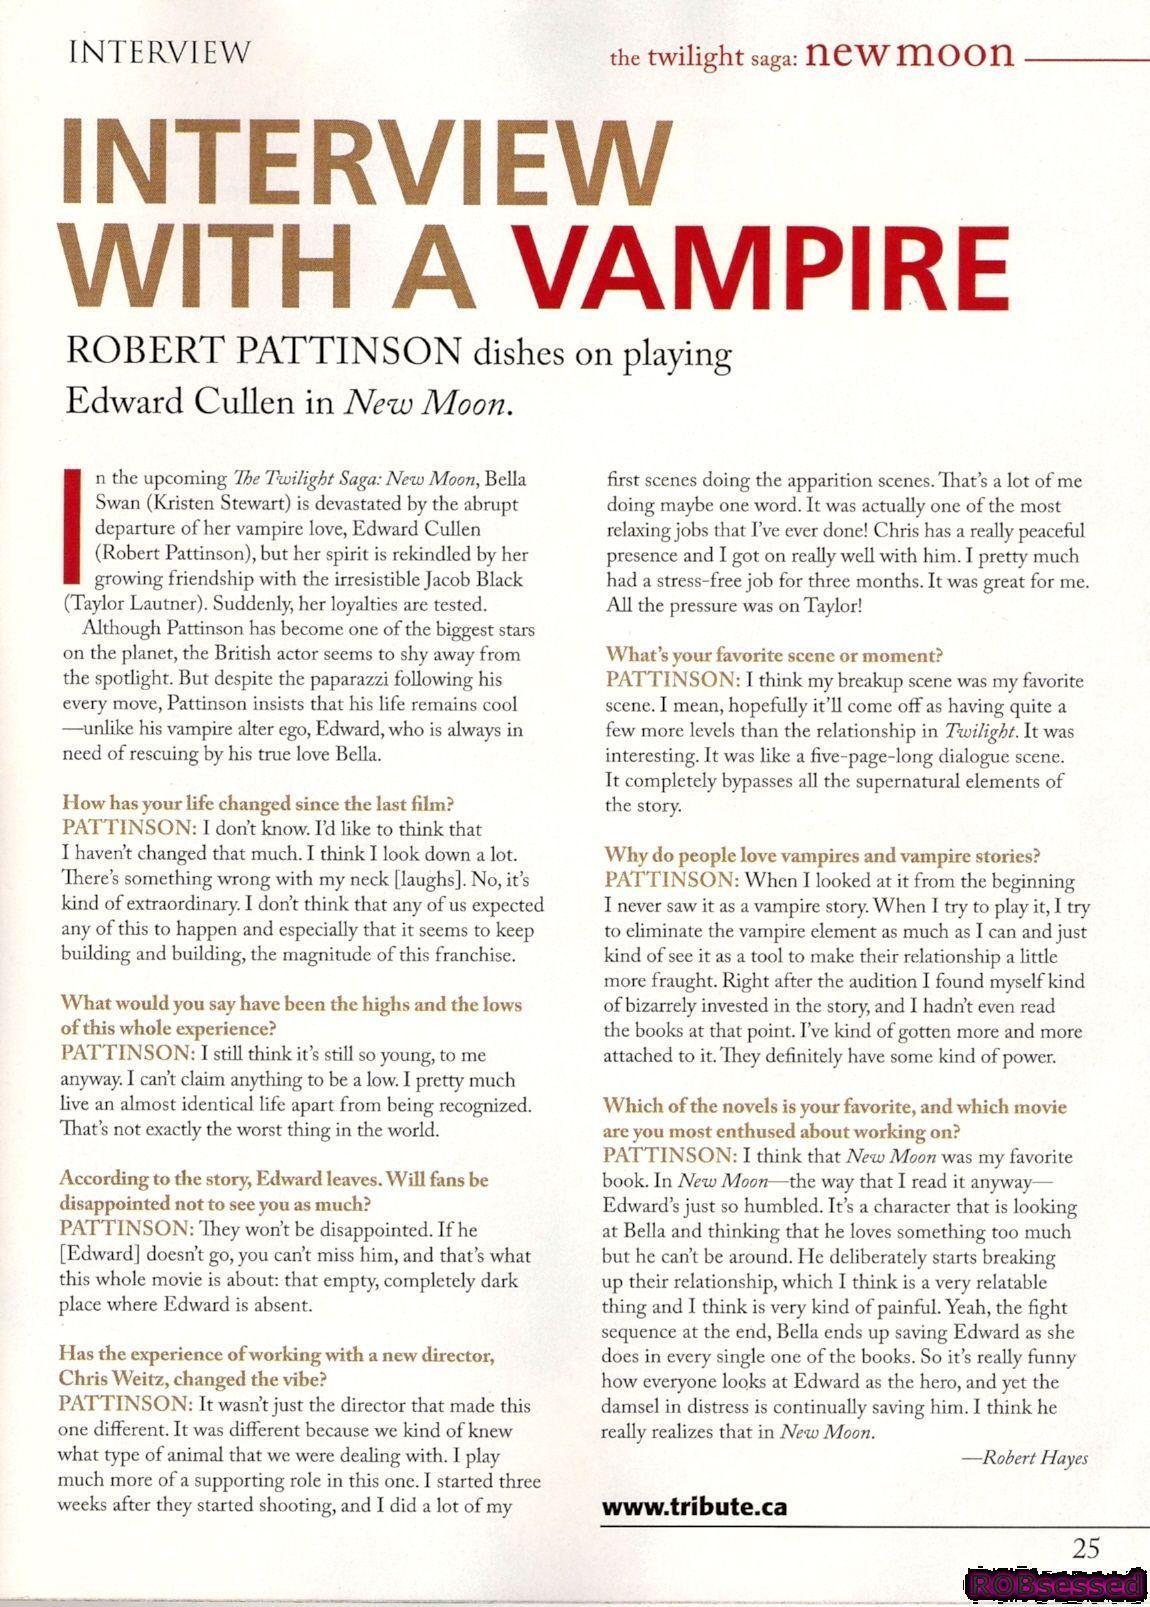 Tribute Magazine scans